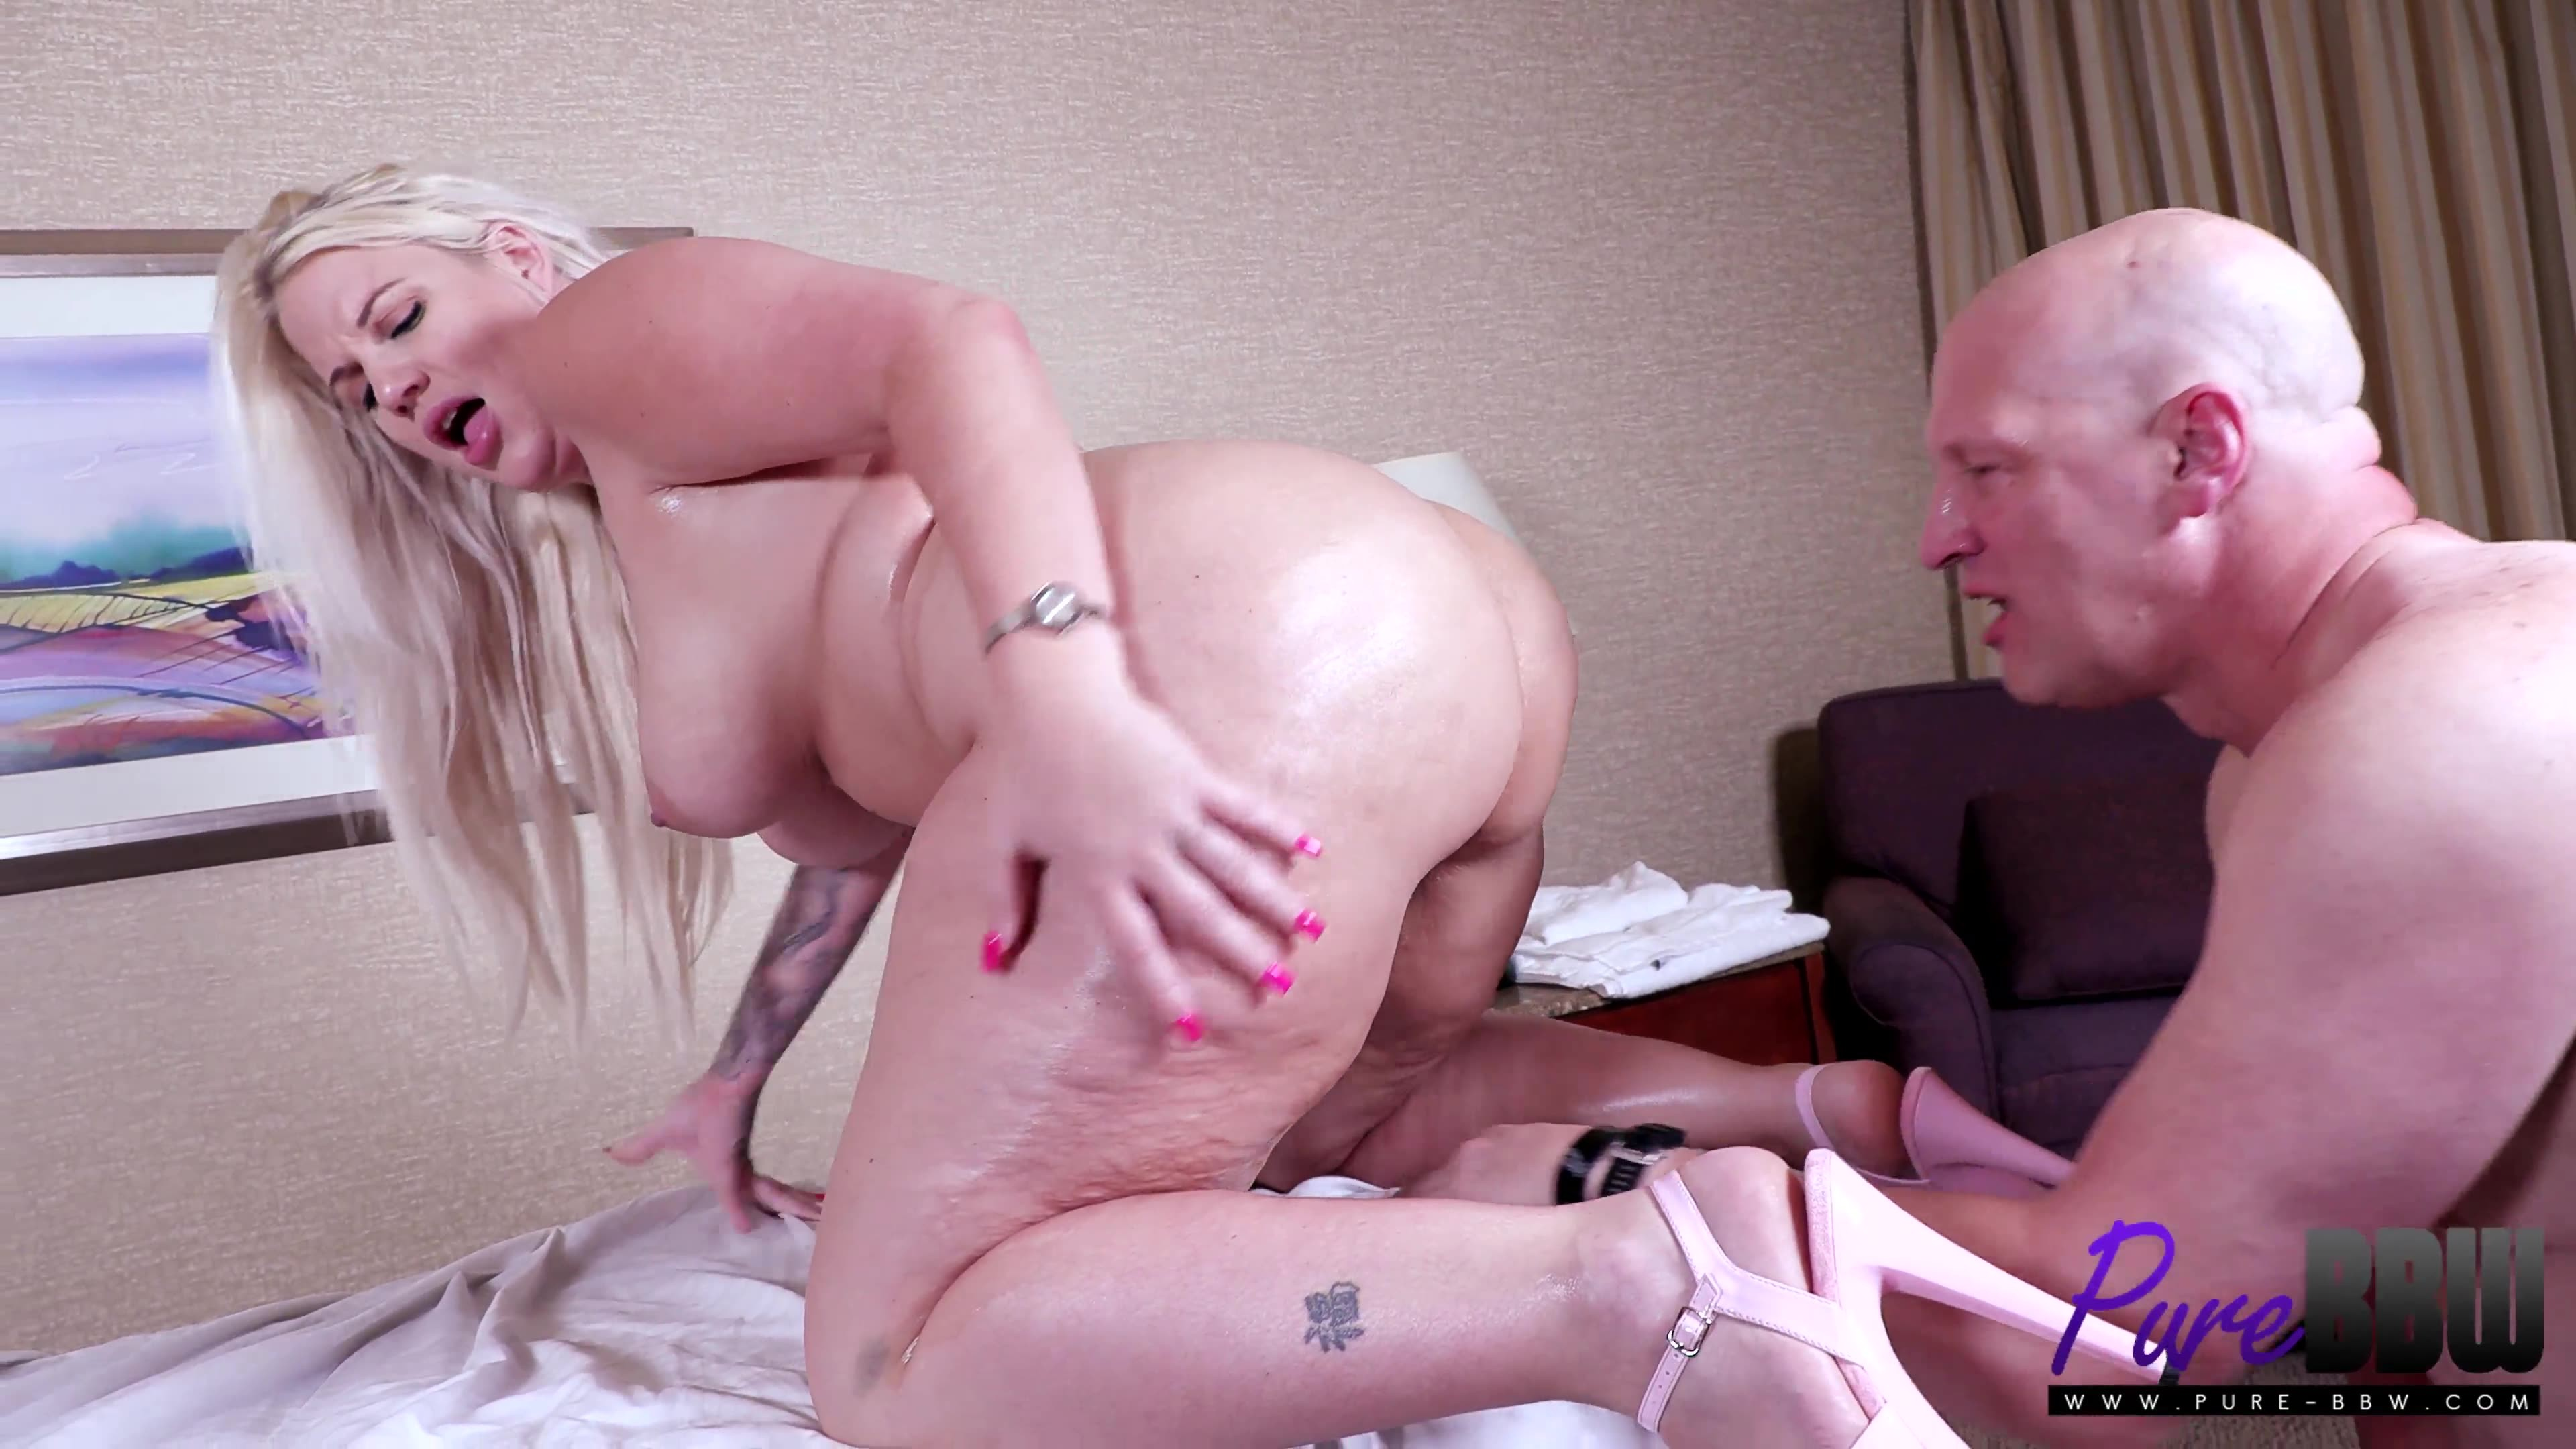 Pure-BBW.21.07.21.LuckyB.Dallas.Big.Booty.Sexual.Massage.XXX.2160p.MP4-OiLED.jpg